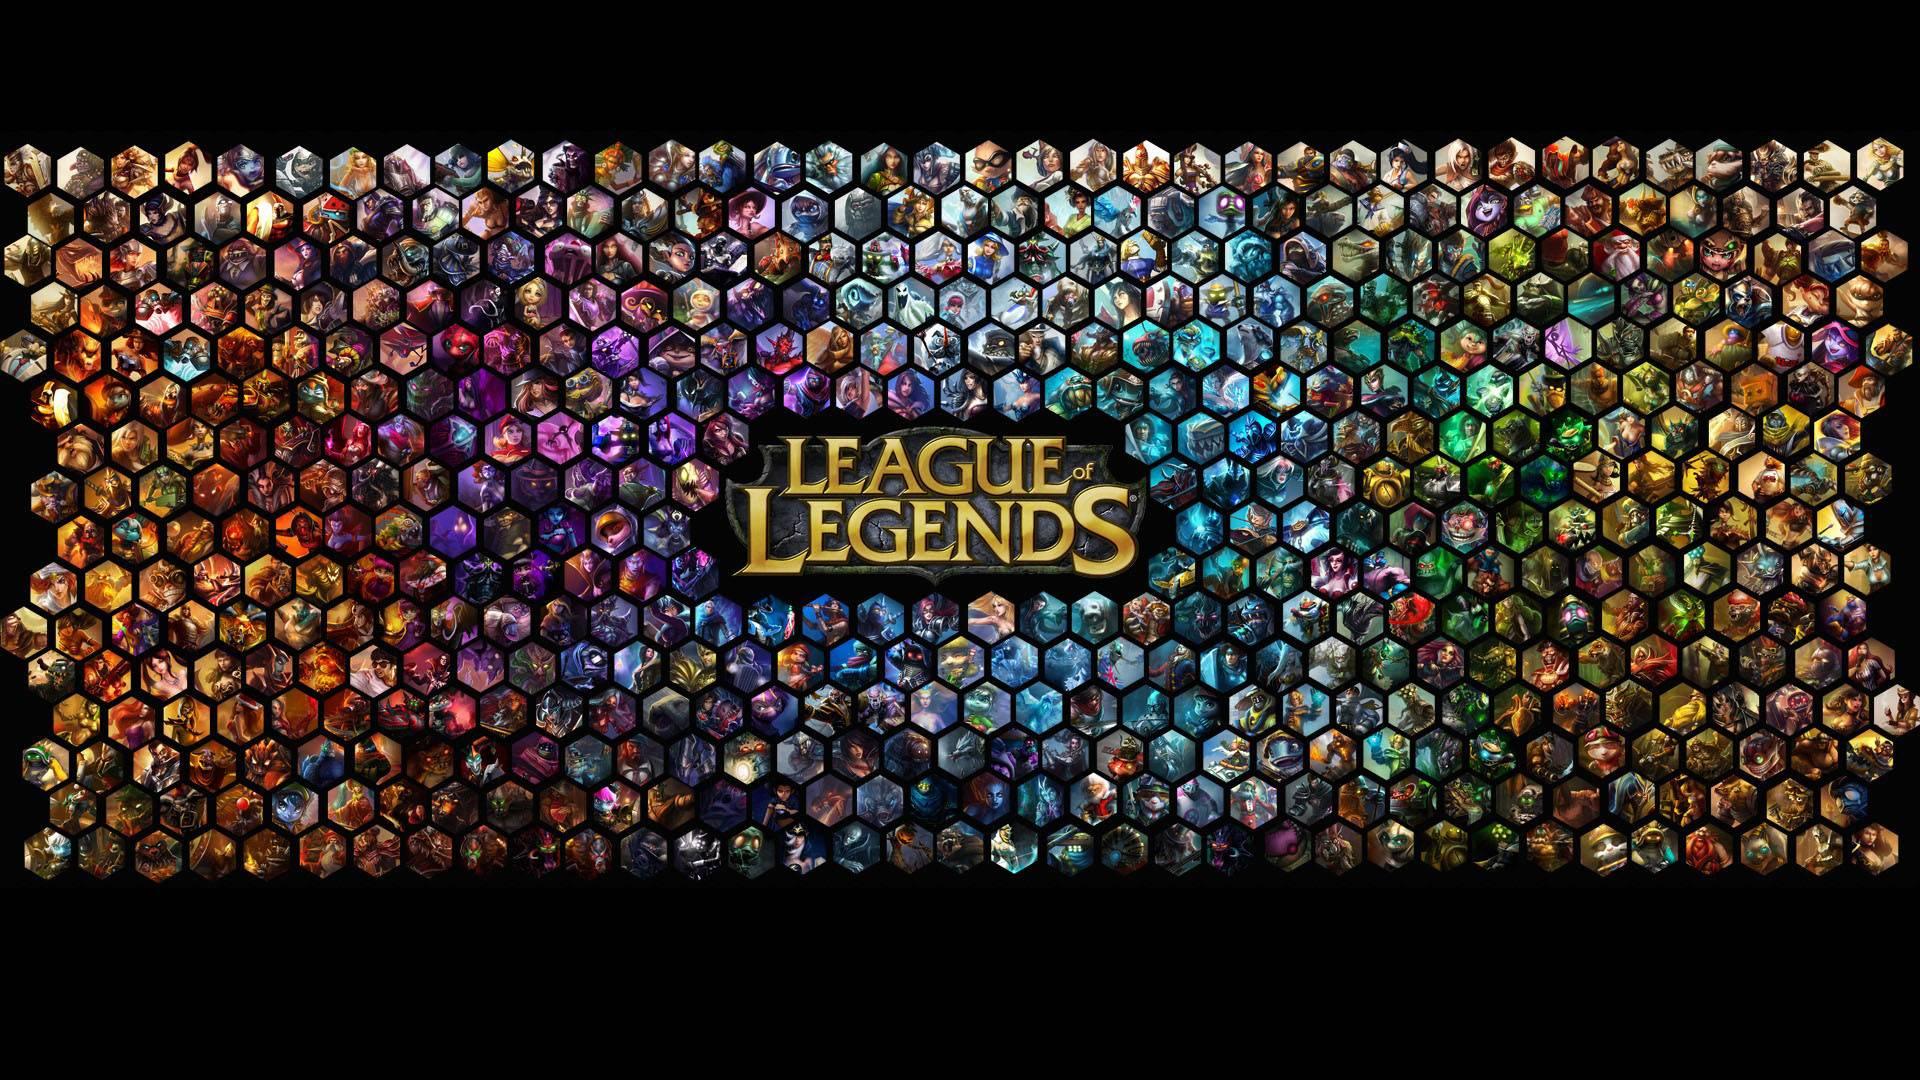 League Of Legends Papéis de Parede HD Planos de Fundo